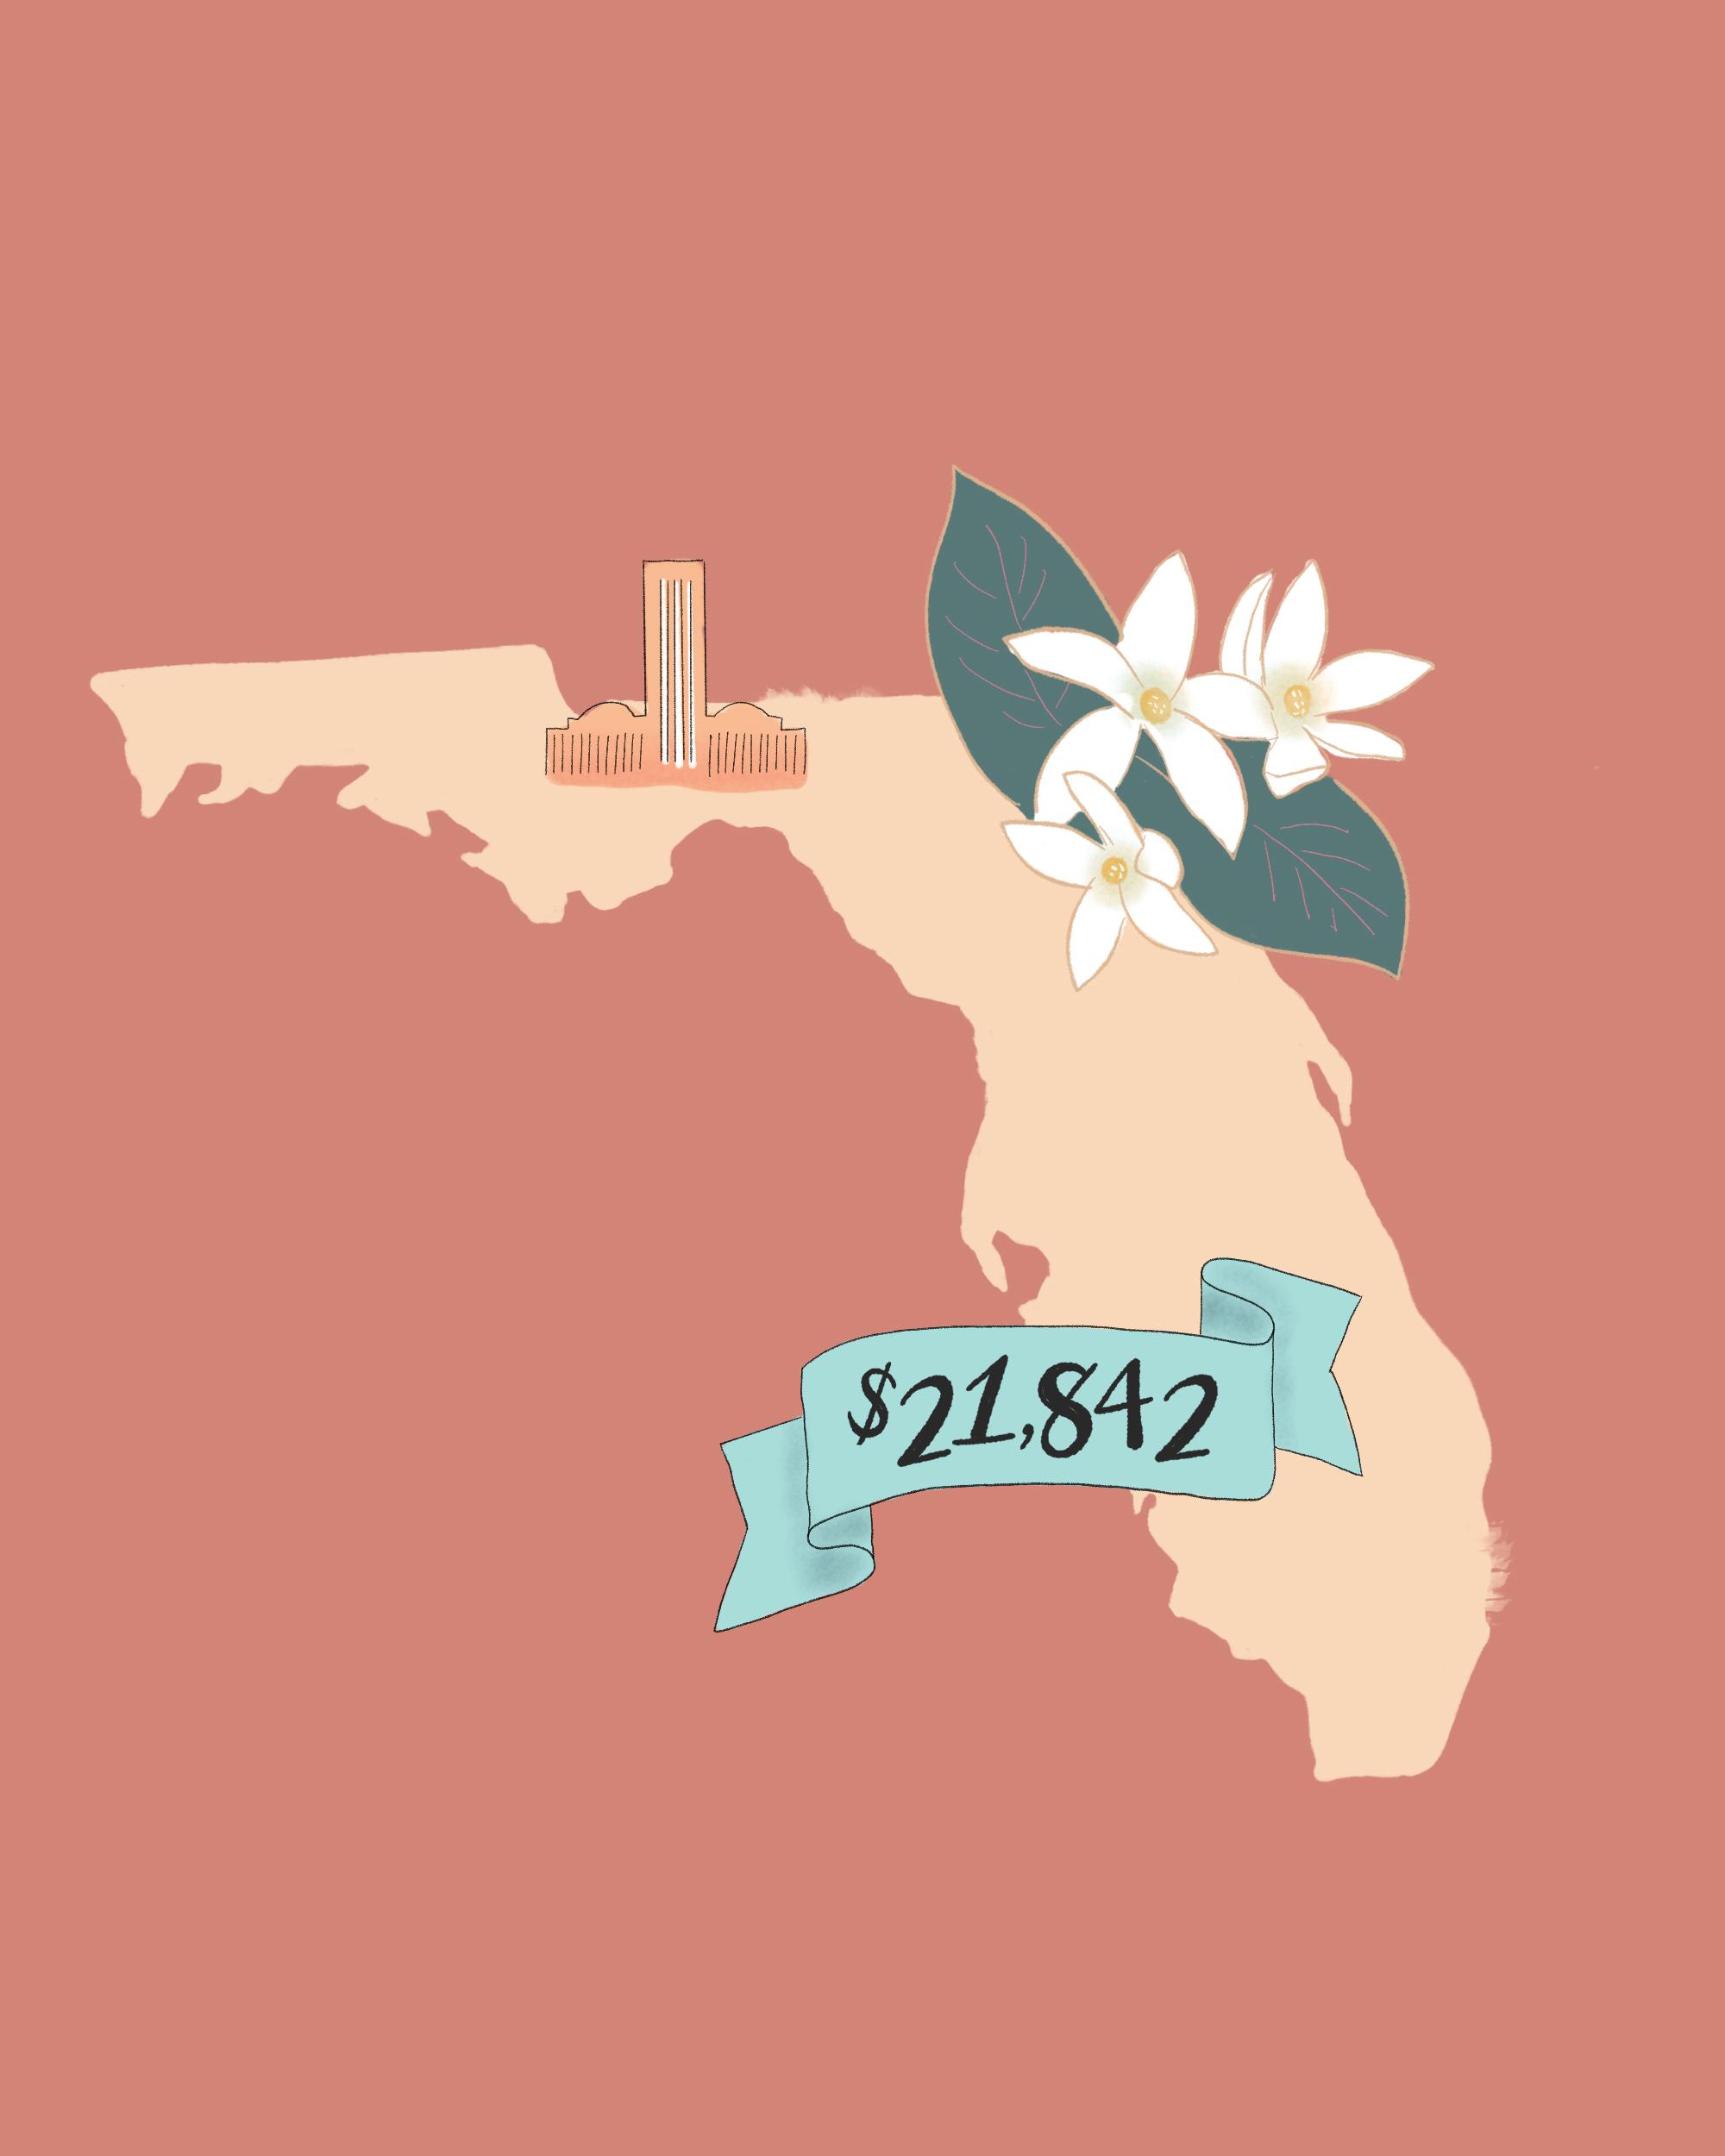 state wedding costs illustration florida